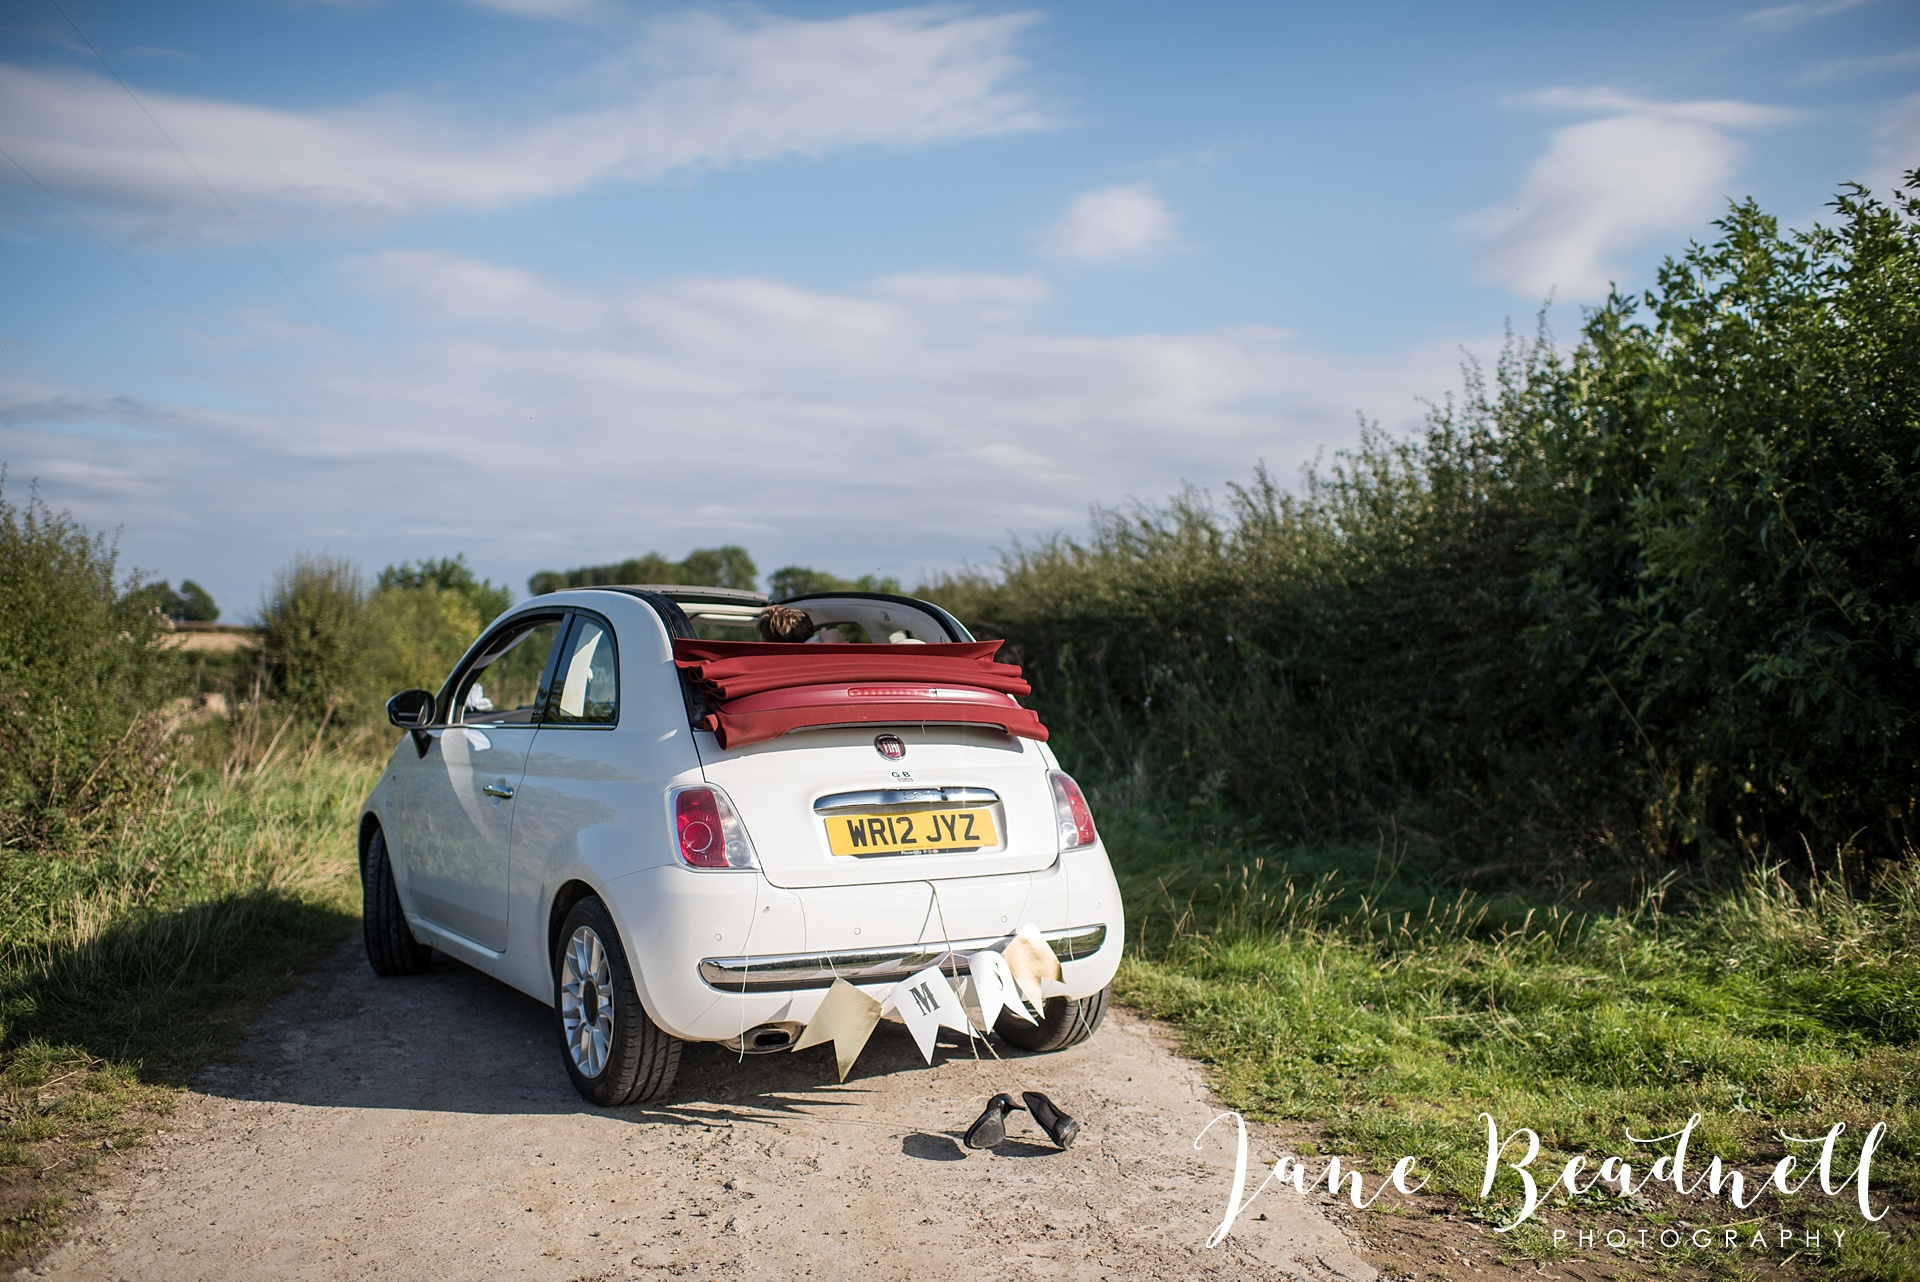 fine-art-wedding-photographer-jane-beadnell-yorkshire-wedding-photographer_0069